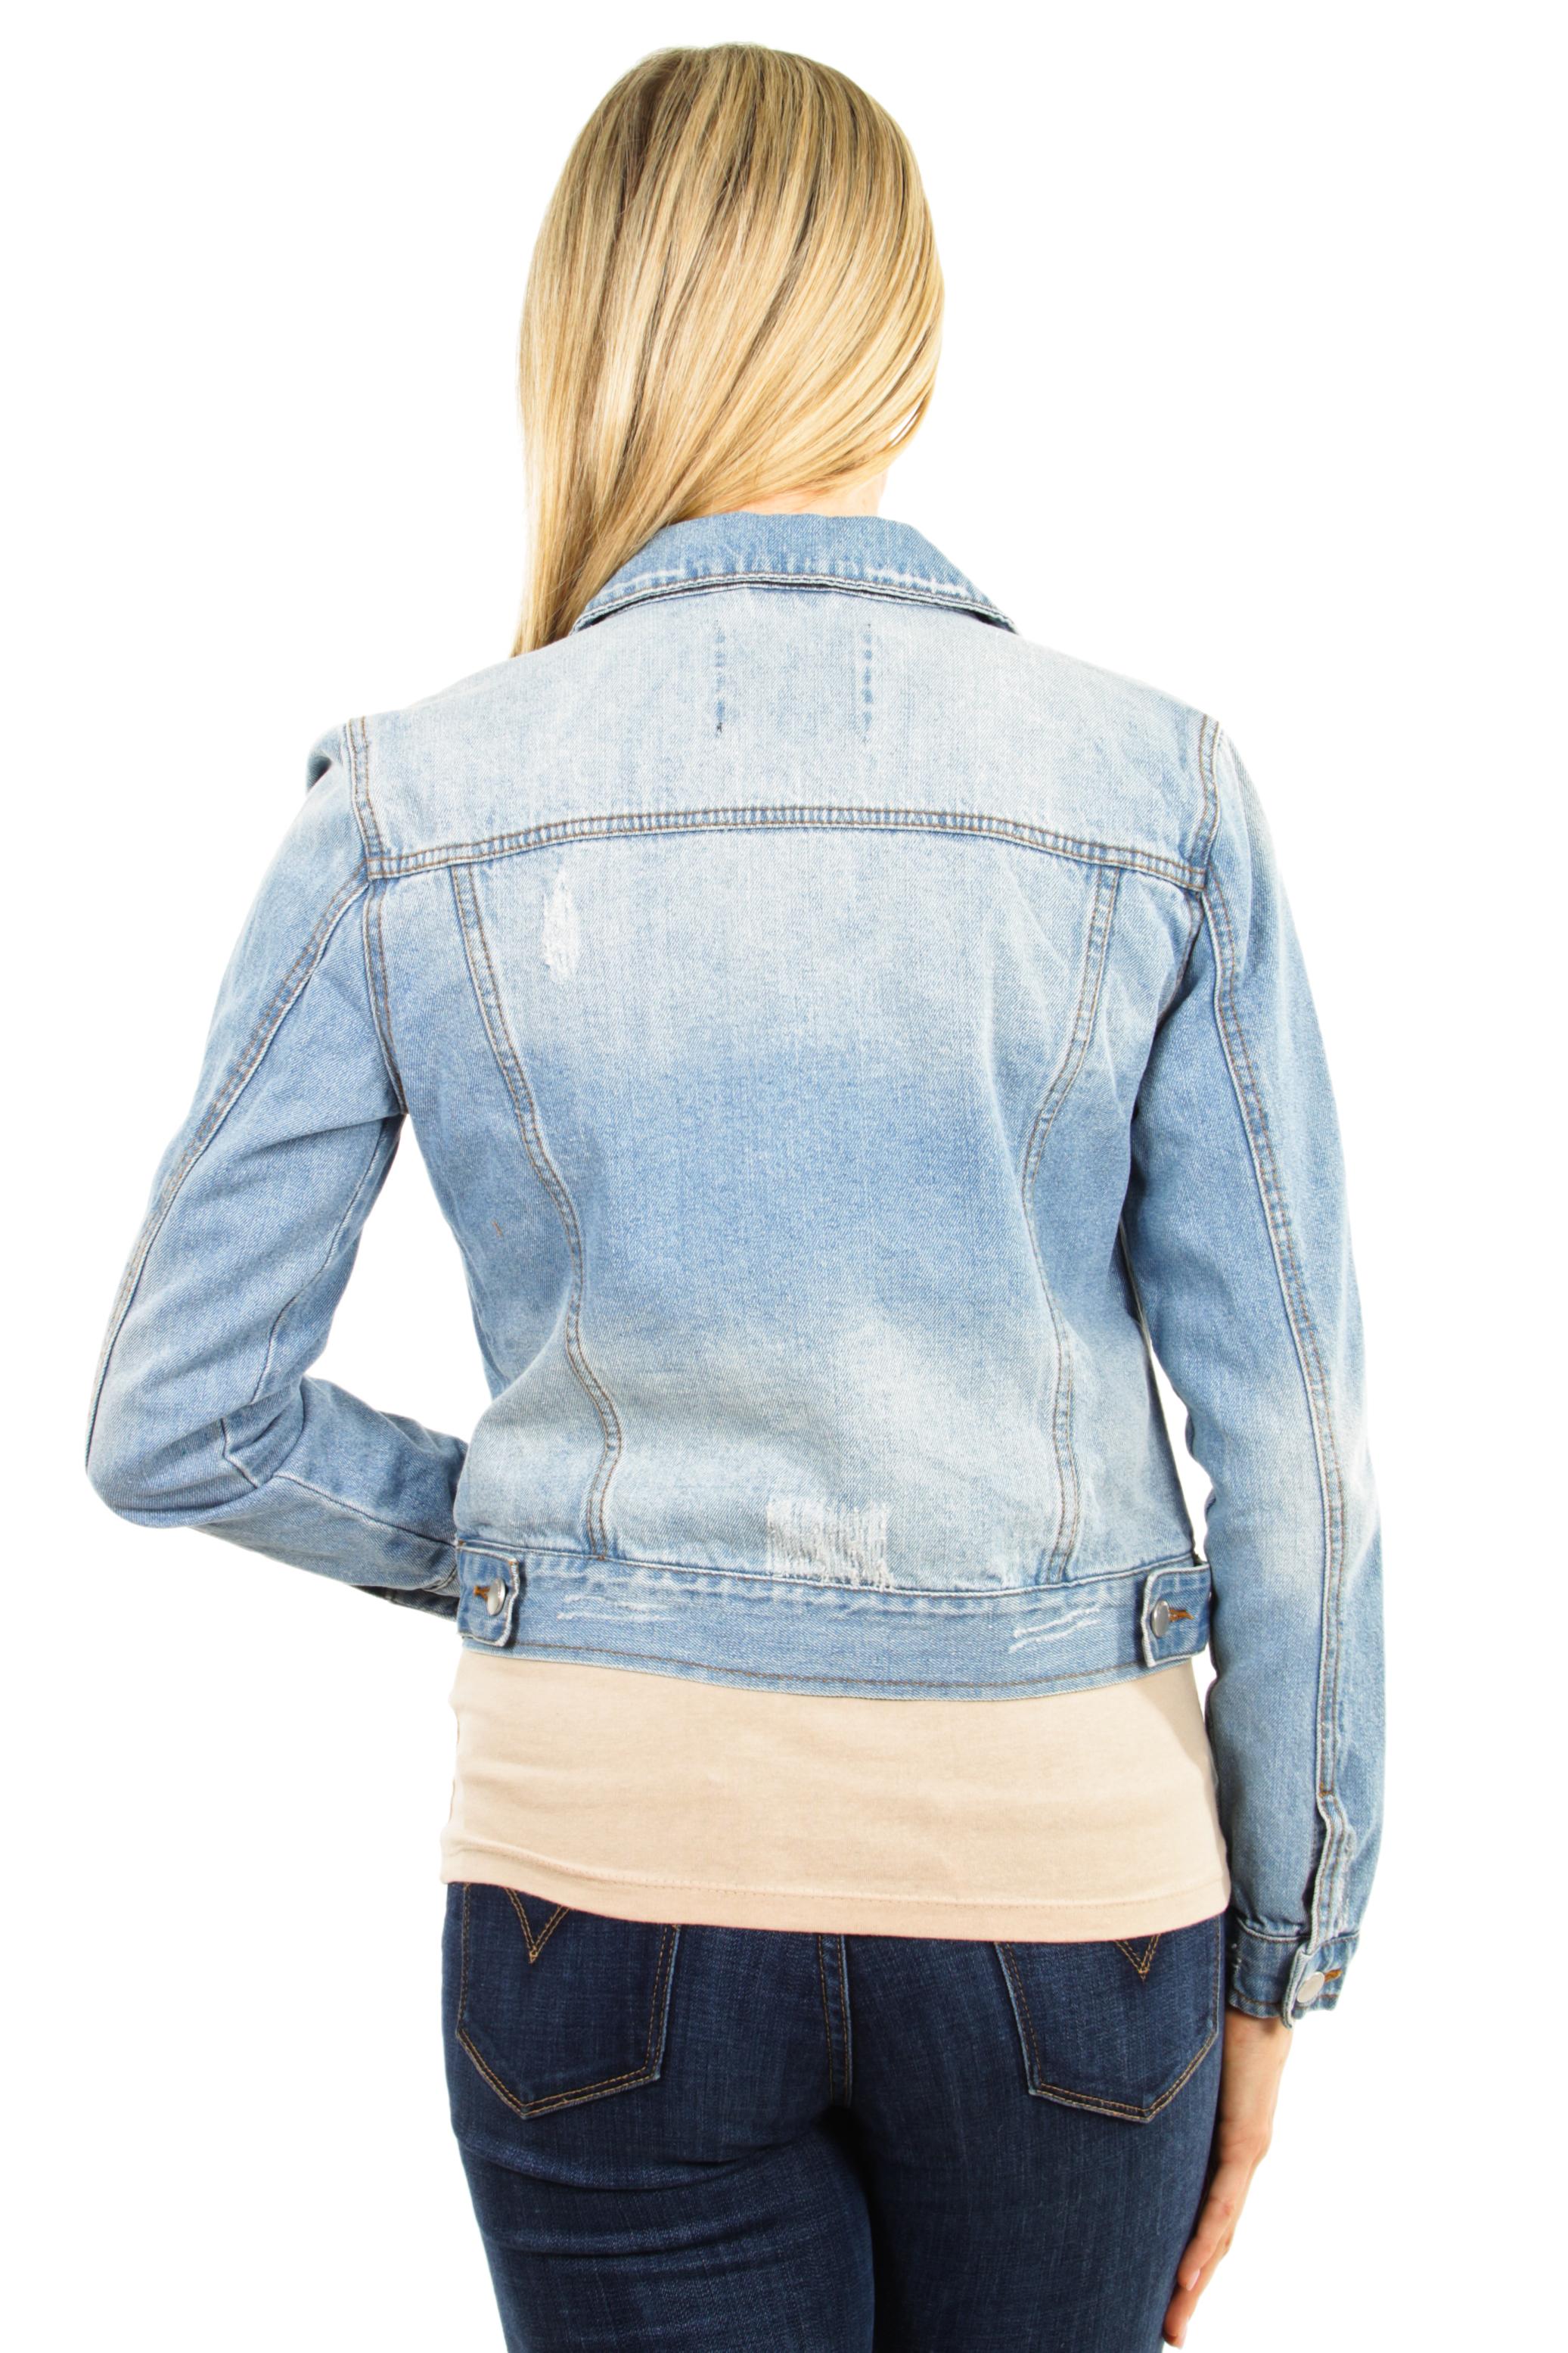 Women-039-s-Juniors-Premium-Distressed-Denim-Long-Sleeve-Jacket thumbnail 9